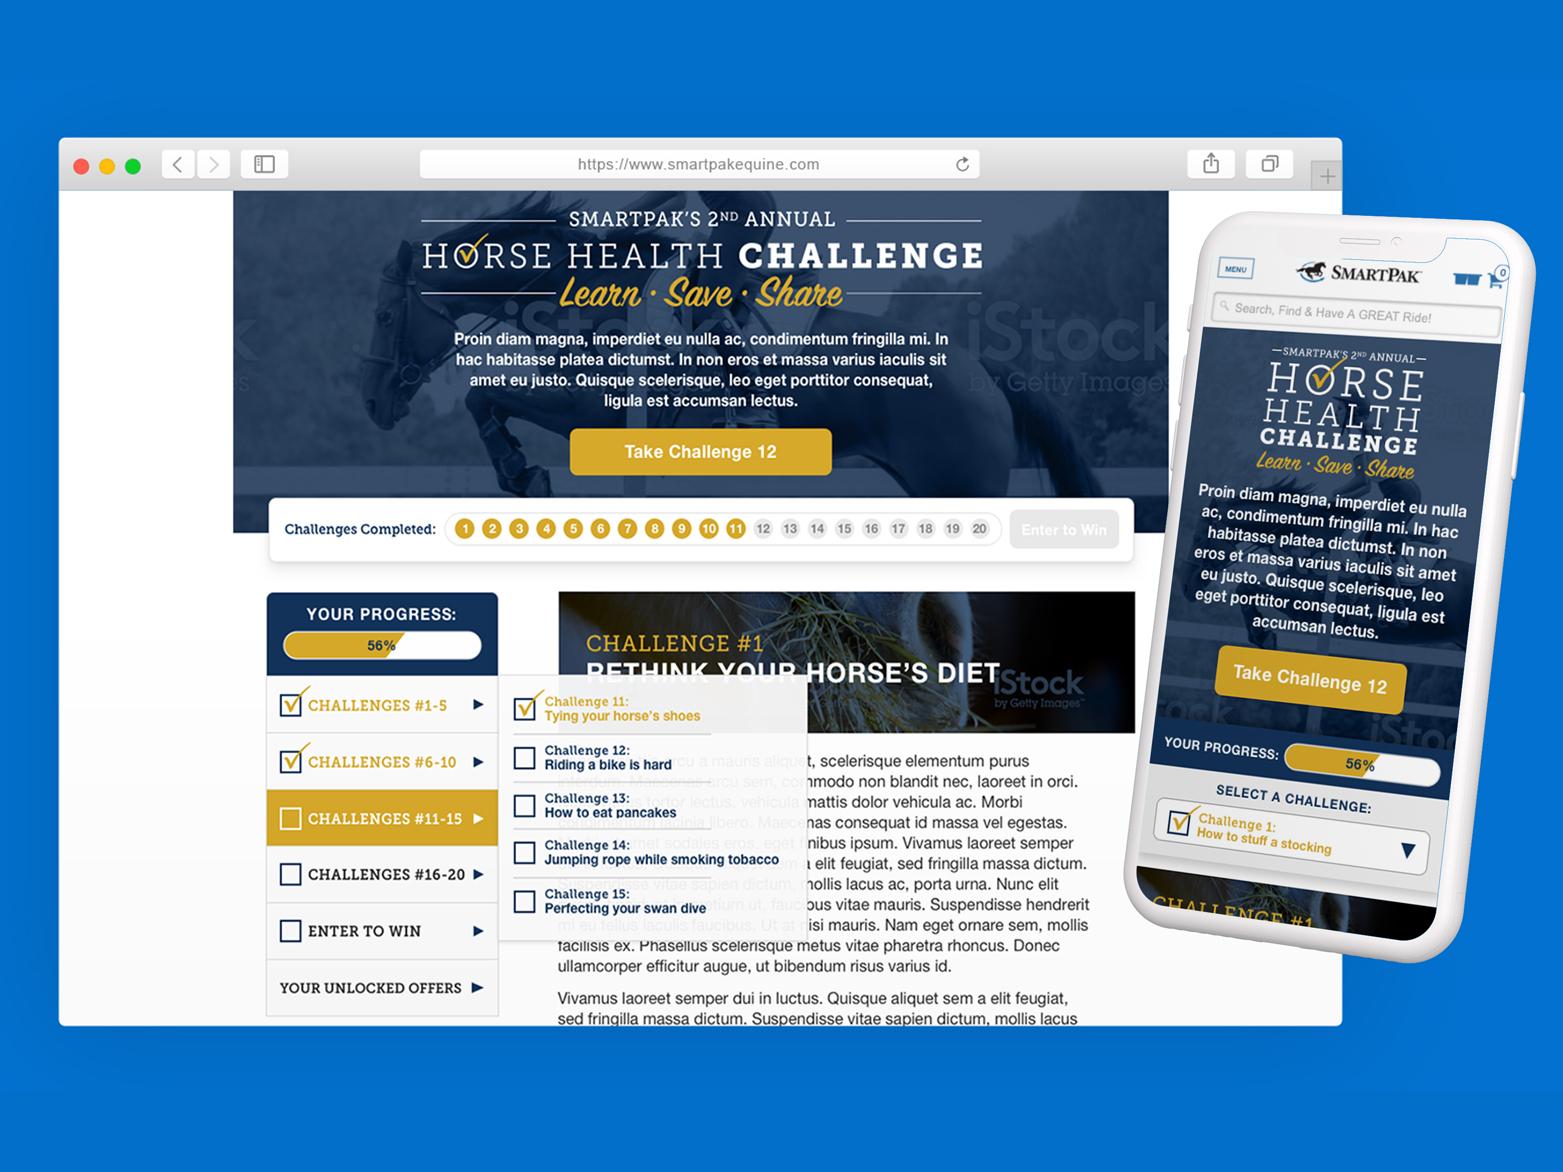 SmartPak's Horse Health Challenge